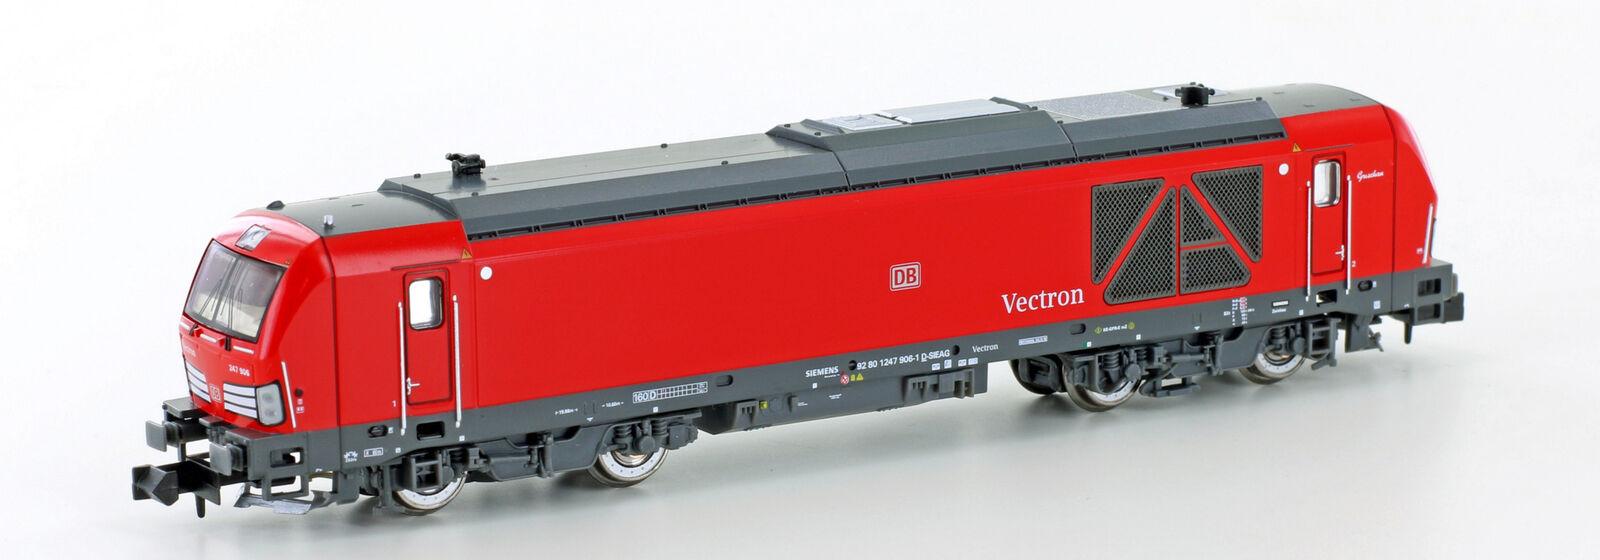 Hobbytrain H 3105-01 S Spur N ELLOK DIESEL BR 247 Vectron dB Sound